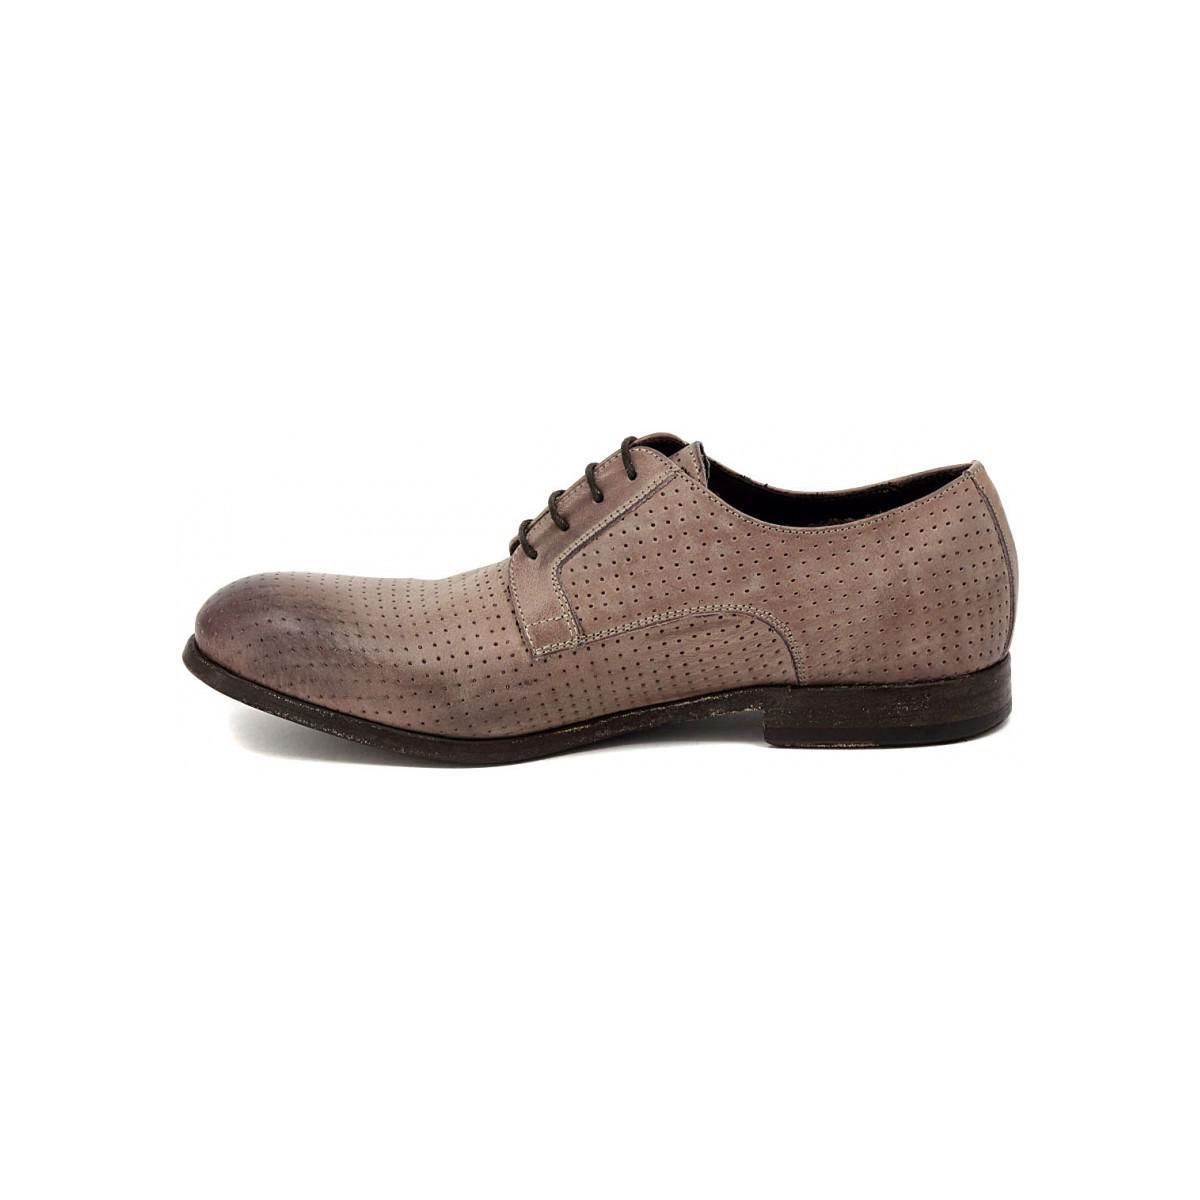 Pawelk's Pawelks Muffy Fori Talpa Gips Men's Casual Shoes In Multicolour in Brown for Men